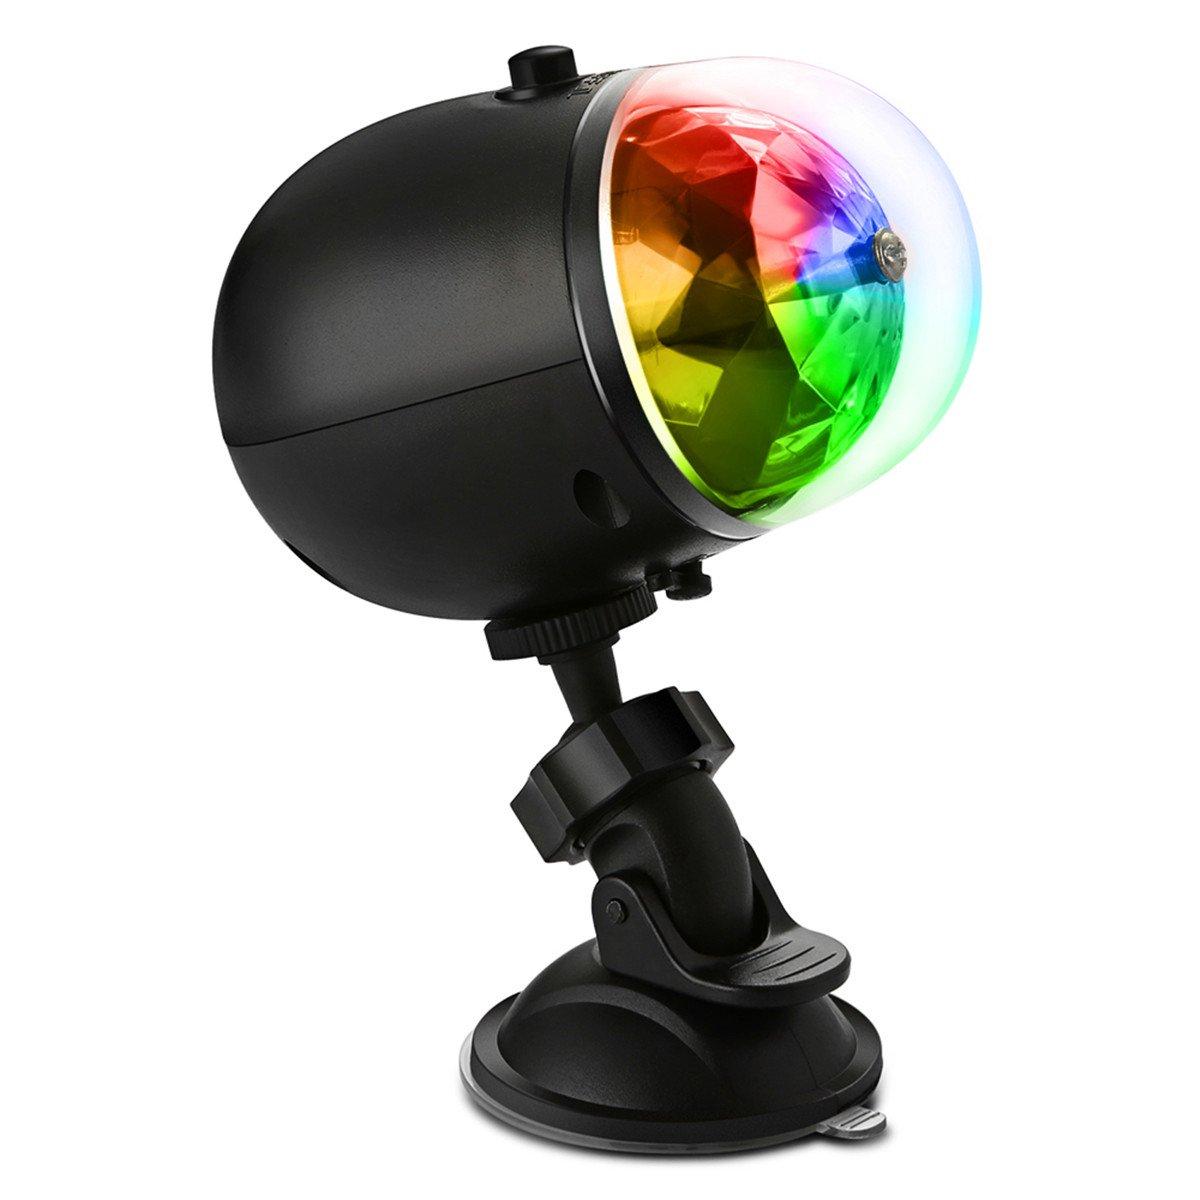 Yaojiaju 3W 1Pcs 200-300 L LED 7-Pattern Colorful Car Disco DJ Effect Stage Light RGB Crystal Mini Rotating Magic Ball Light for Outdoor Dance Floor Live Show